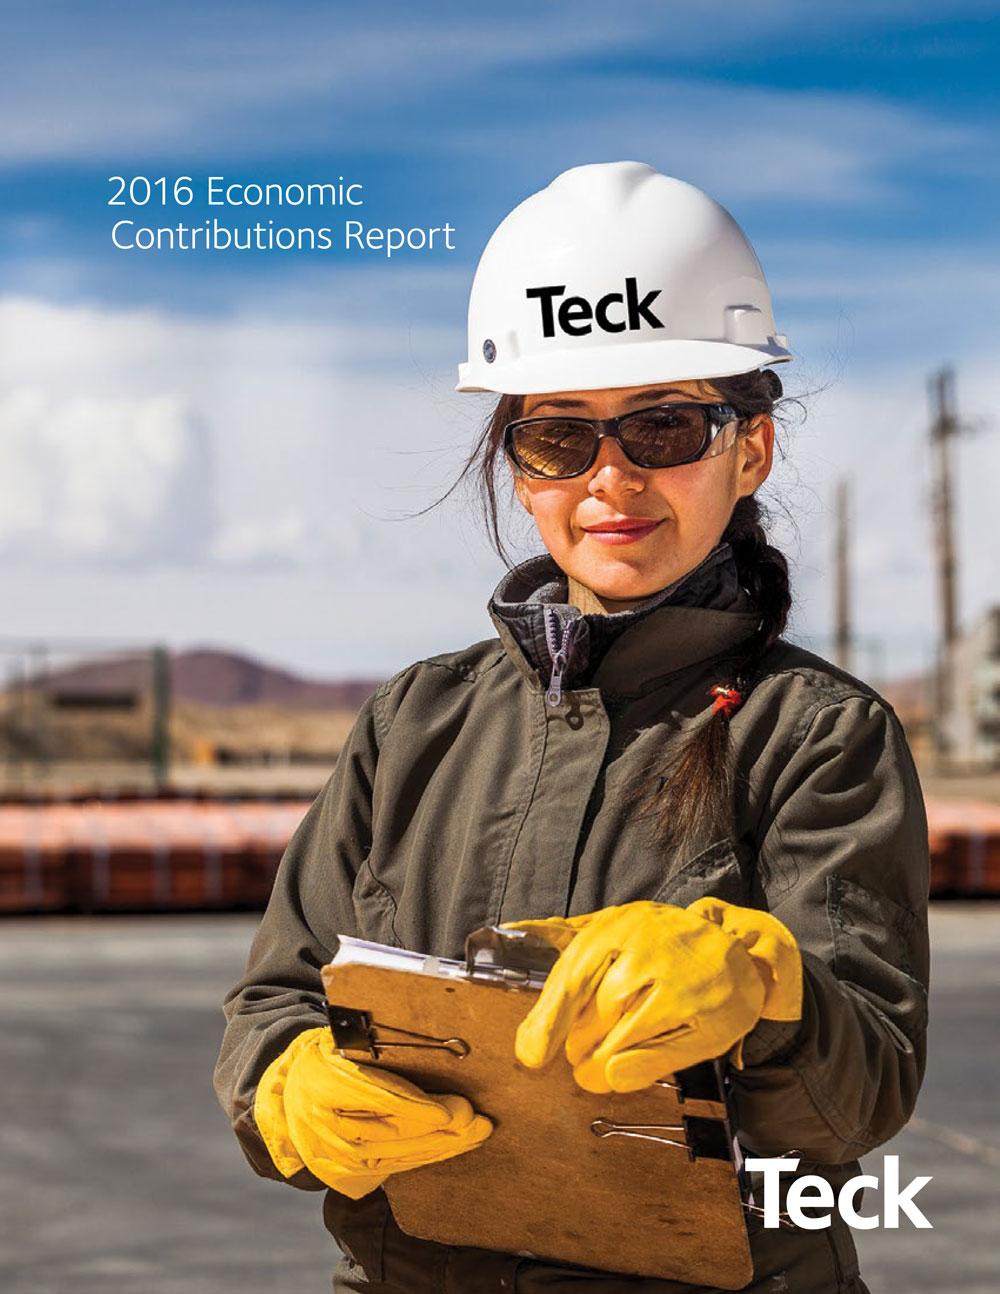 2016_Teck_Economic_Contributions_Report_Cover_Image_0.jpg